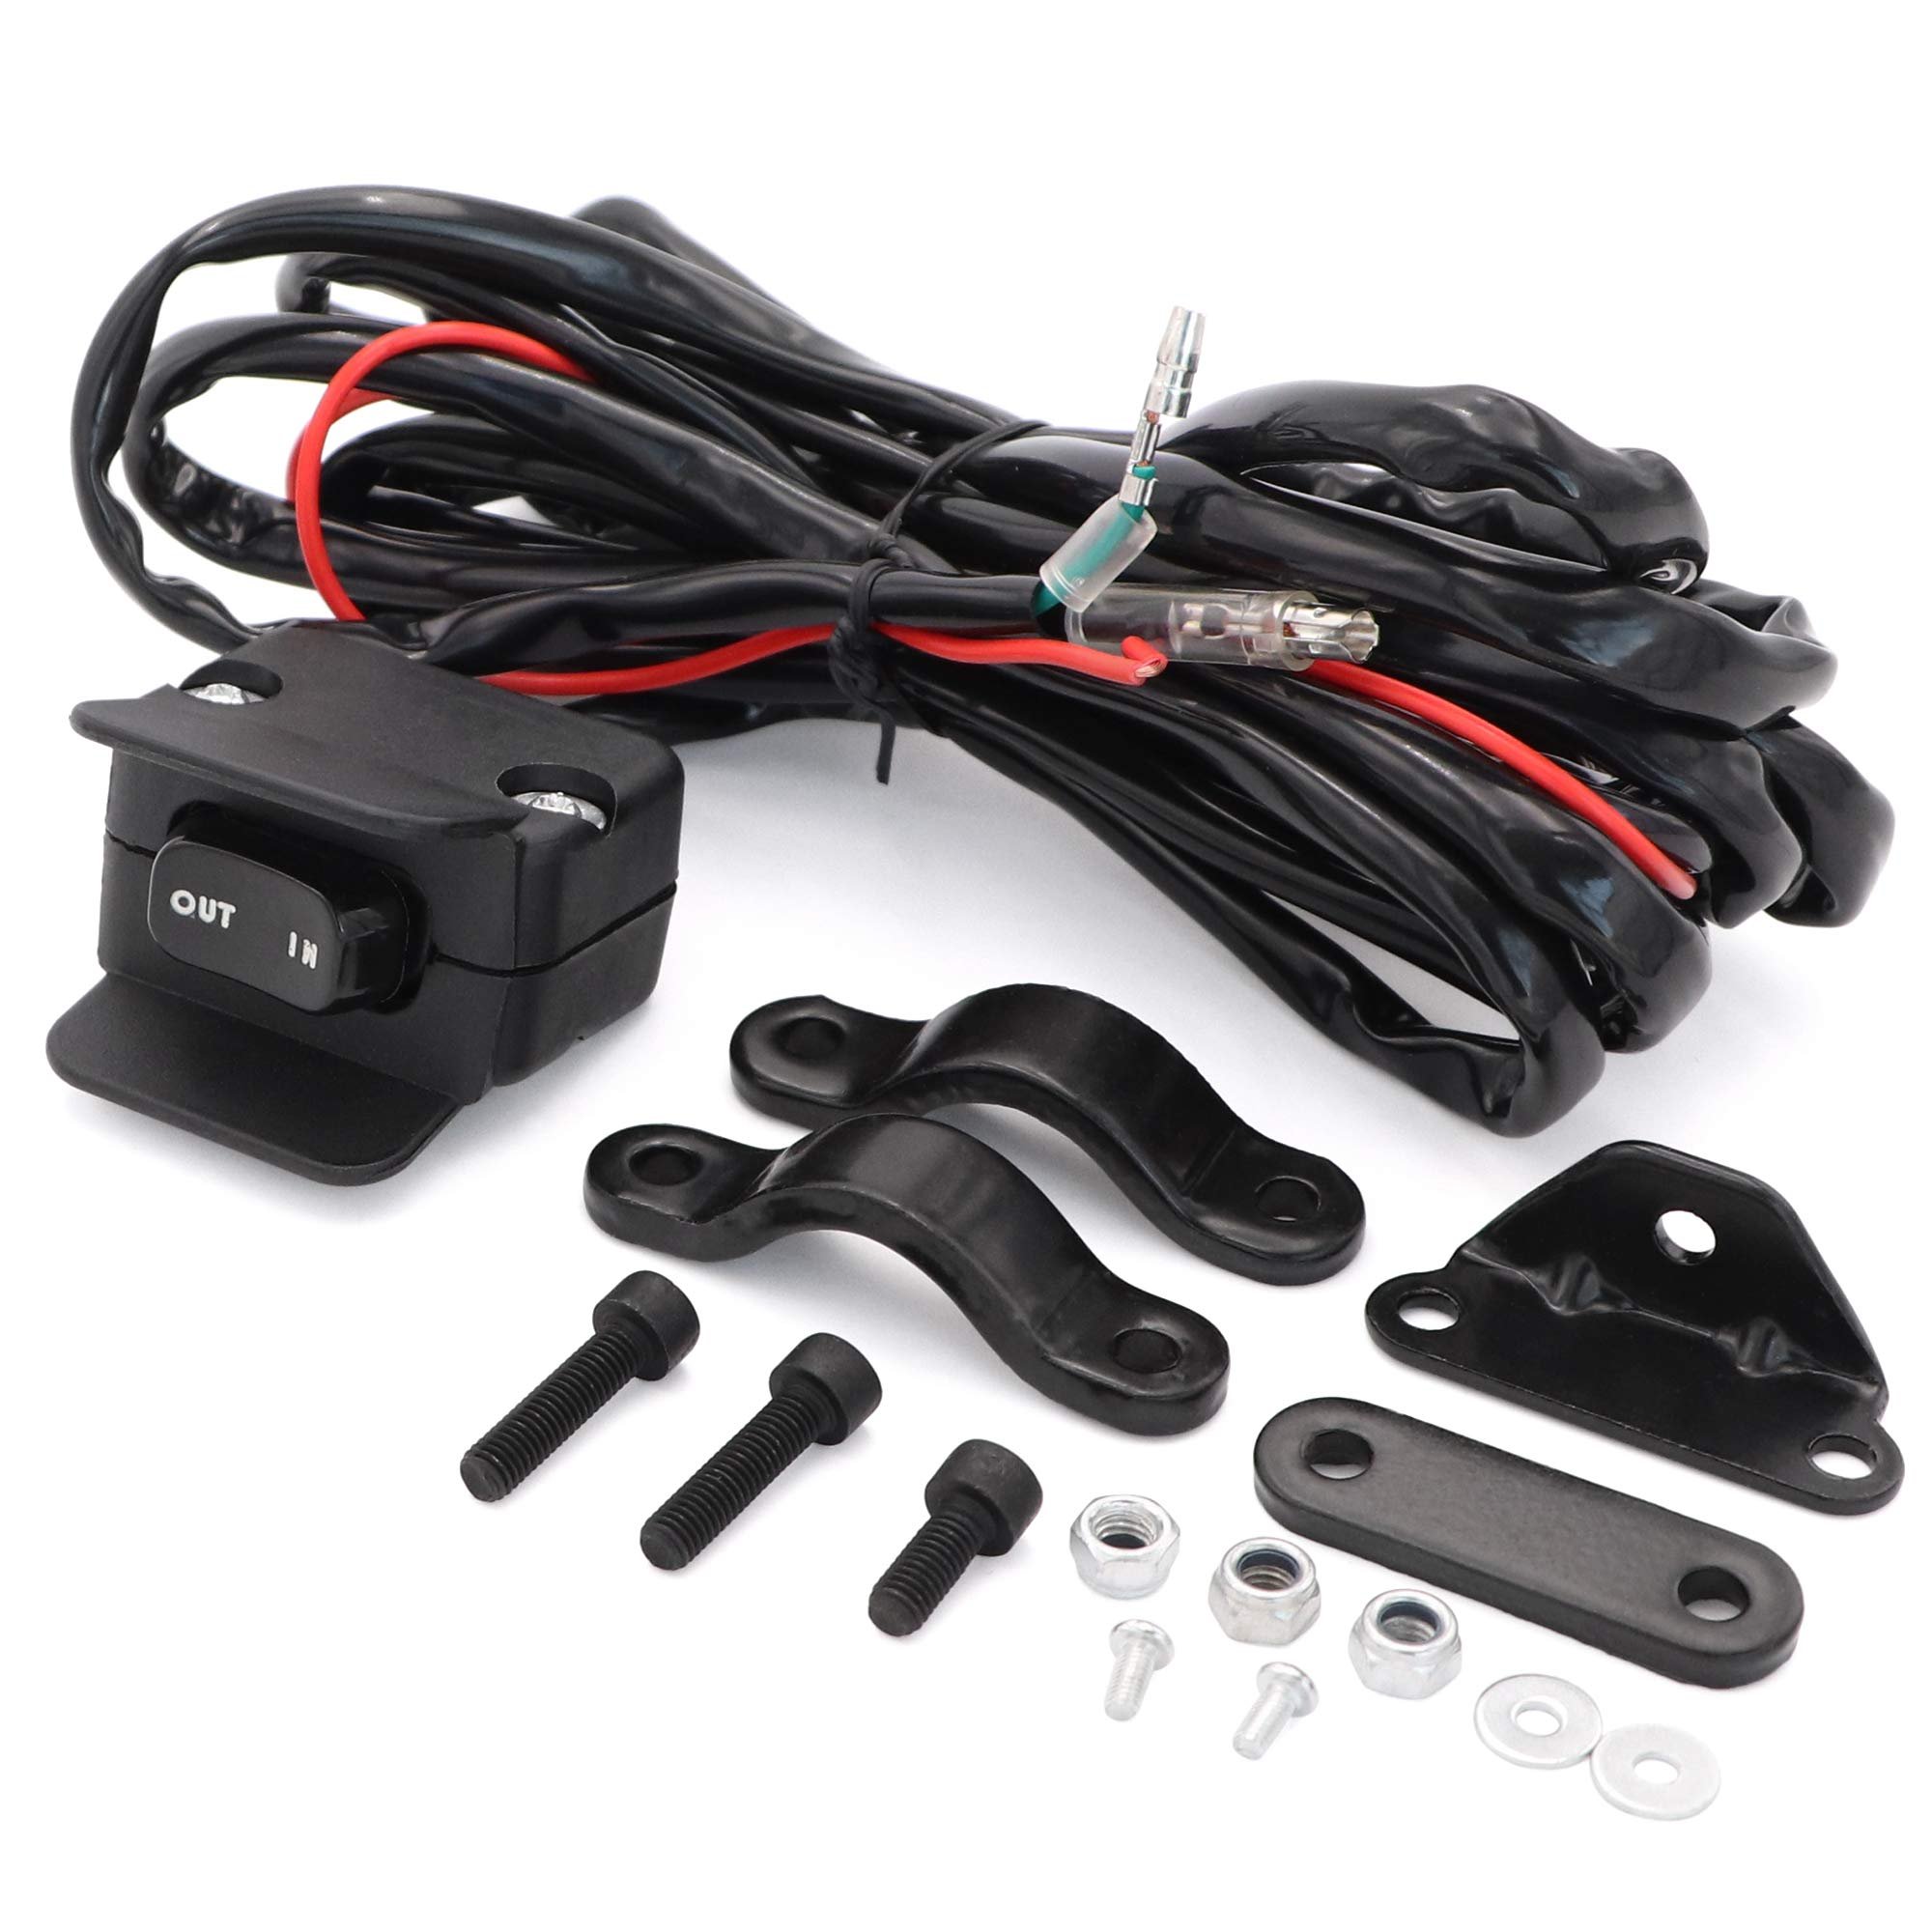 Taukealugs 12V Winch Rocker Thumb Switch with Mounting Bracket Handlebar Control line kit for ATV UTV by Taukealugs